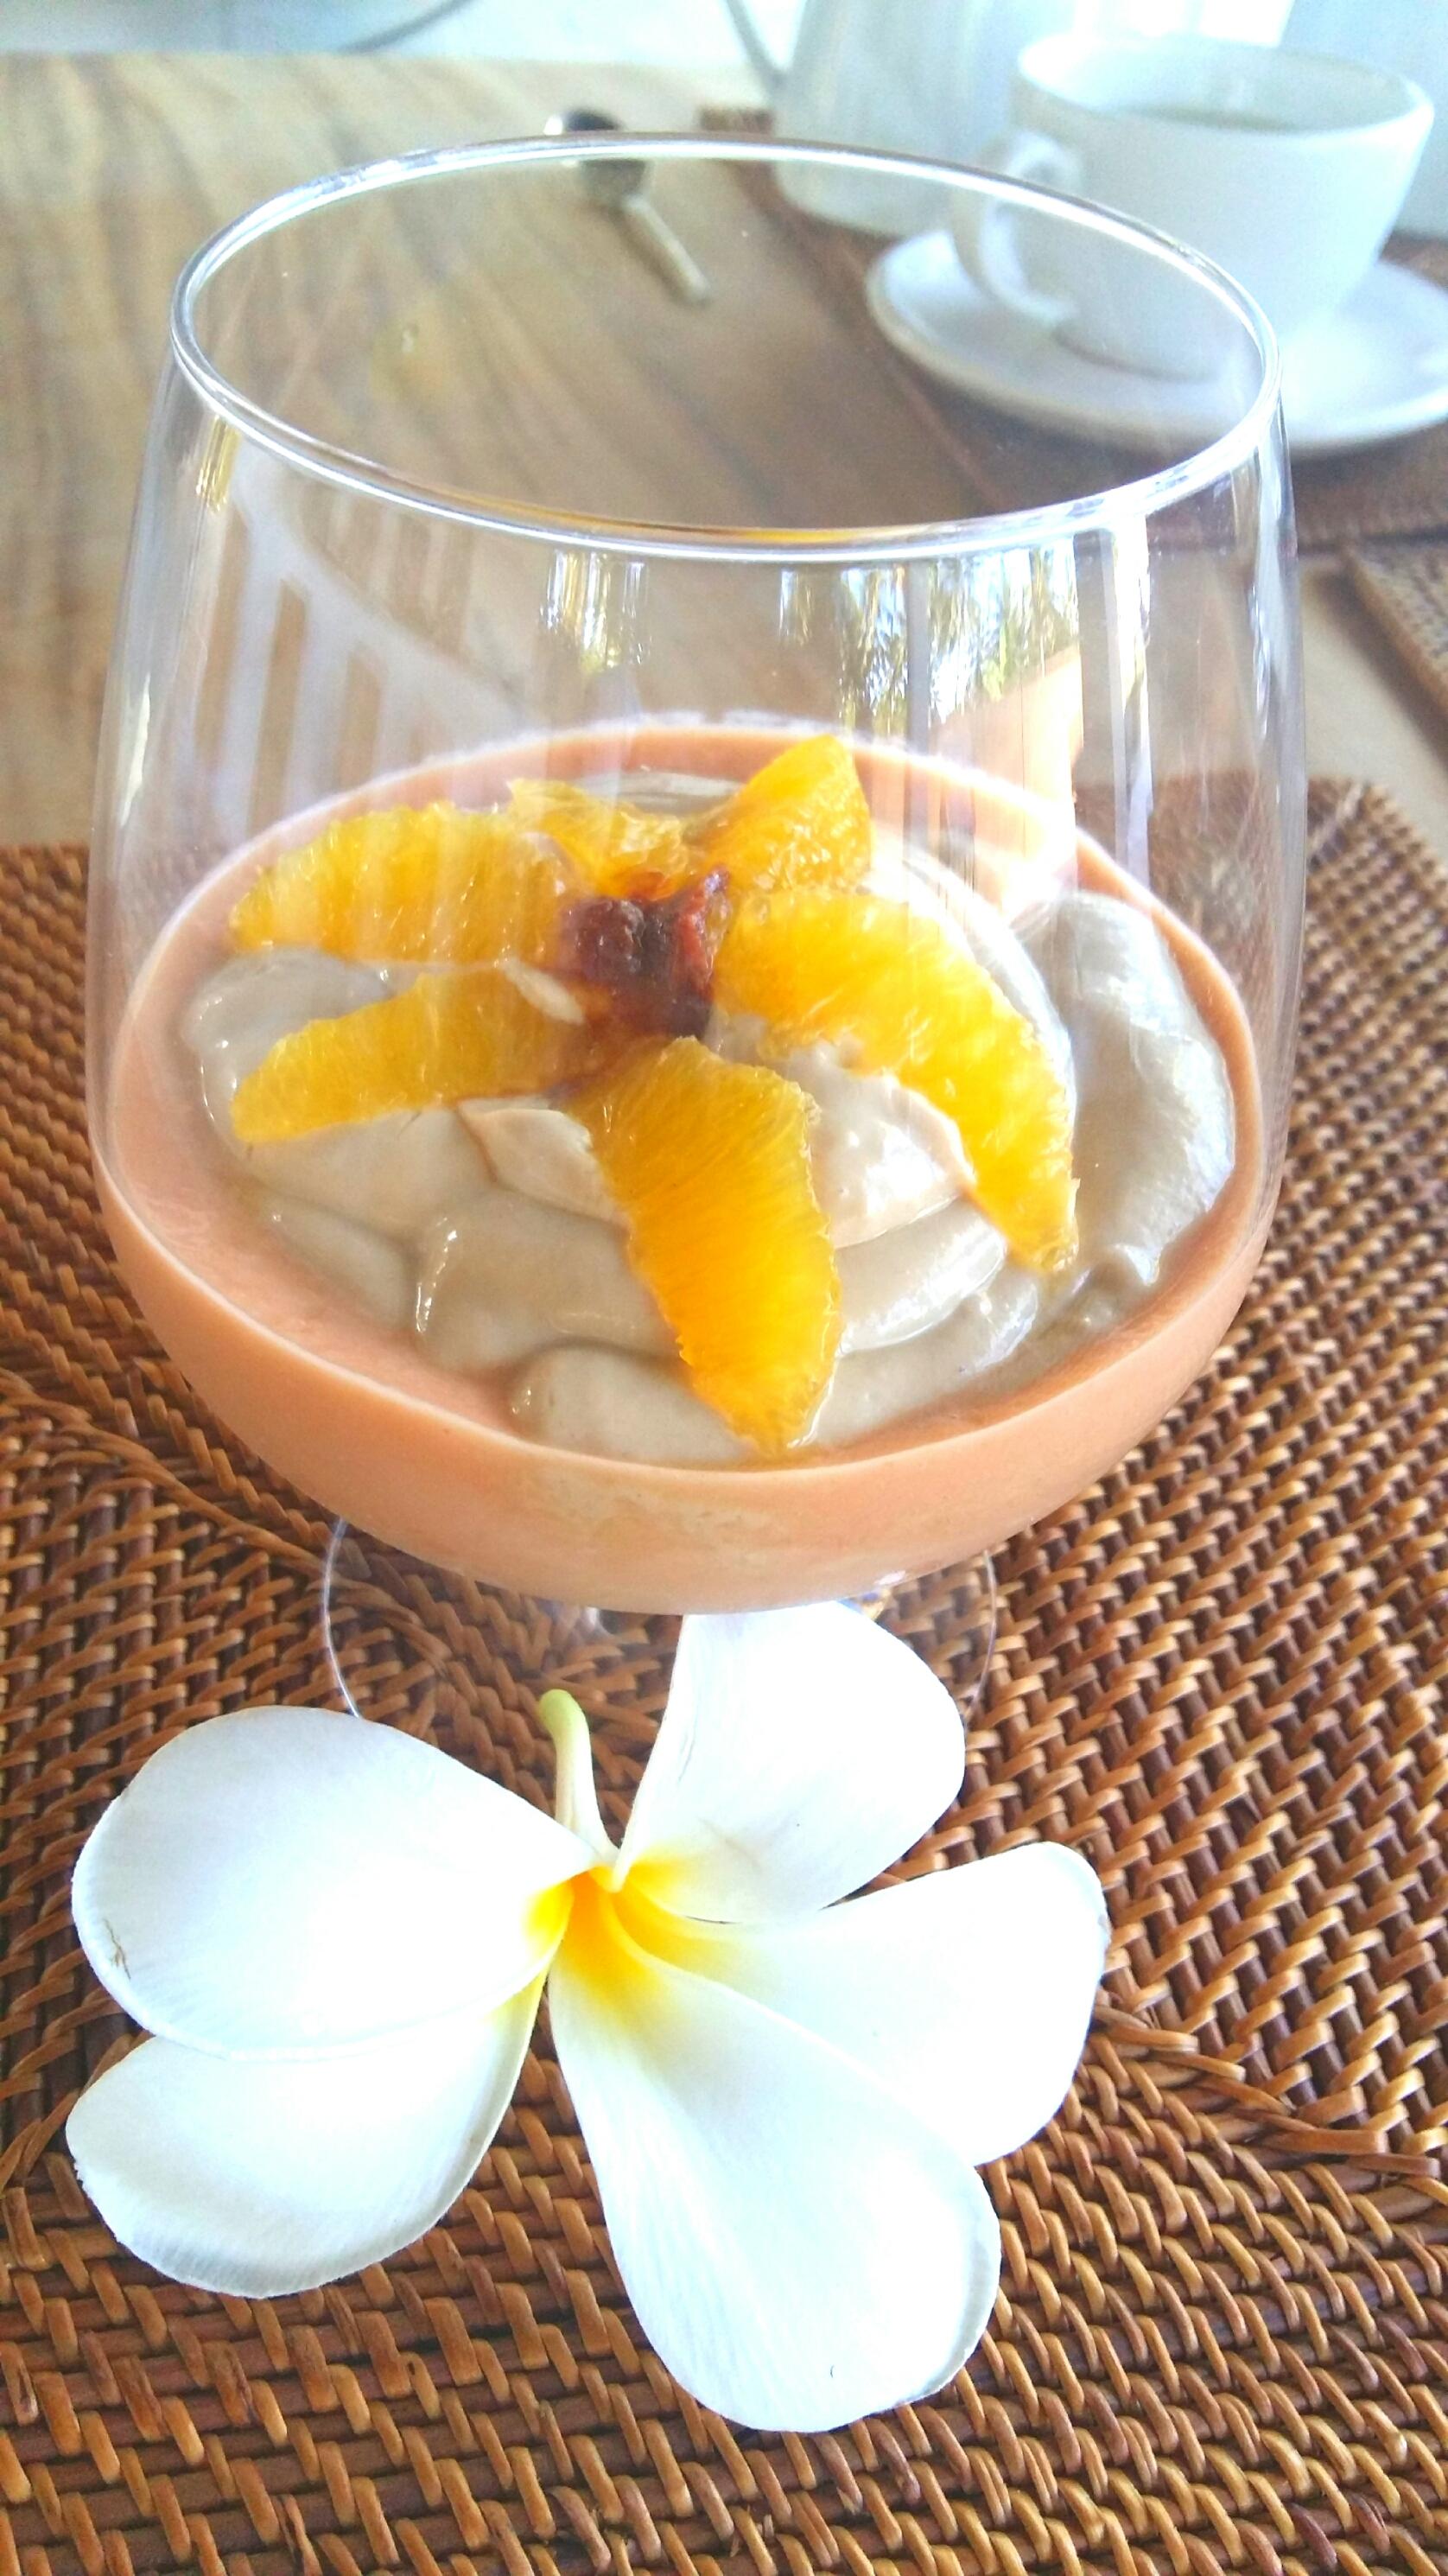 Papaya-Bananen-Pudding.jpg